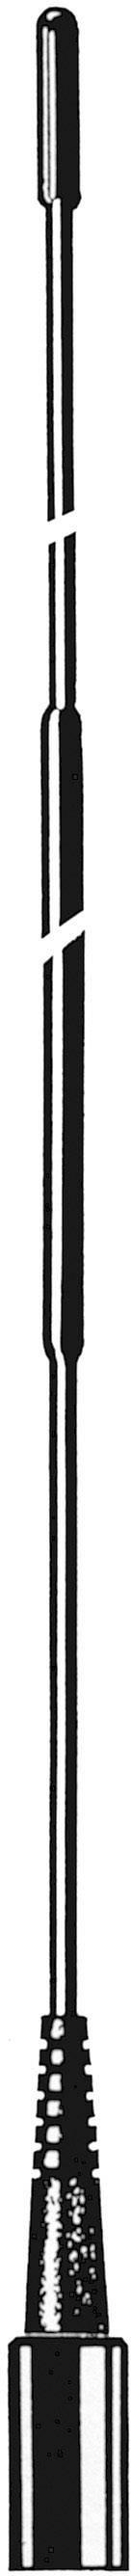 Rádiová anténa Albrecht Hyflex CL 27 BNC